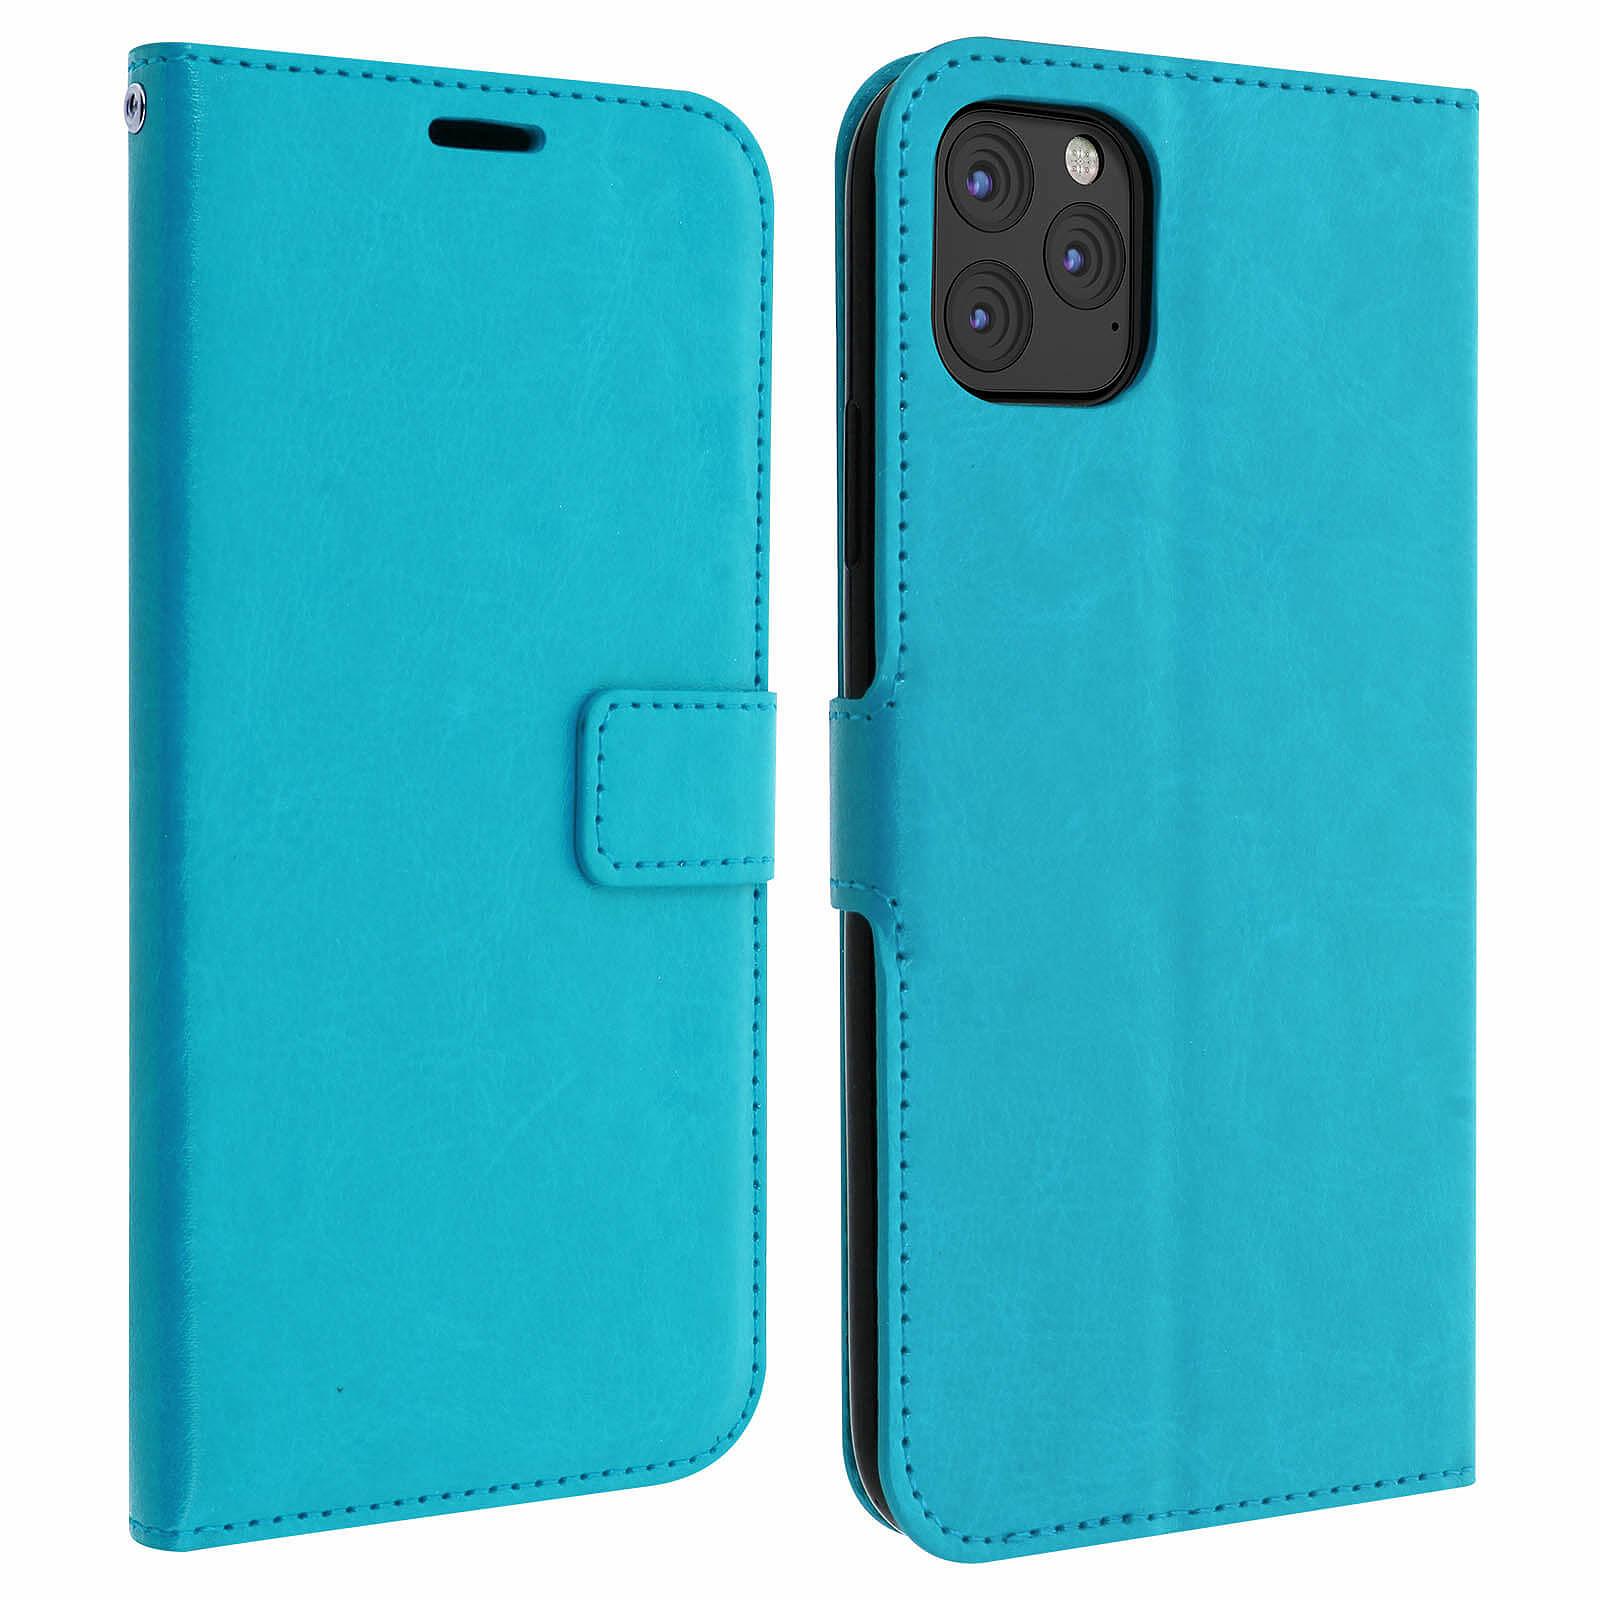 Avizar Etui folio Turquoise pour Apple iPhone 11 Pro